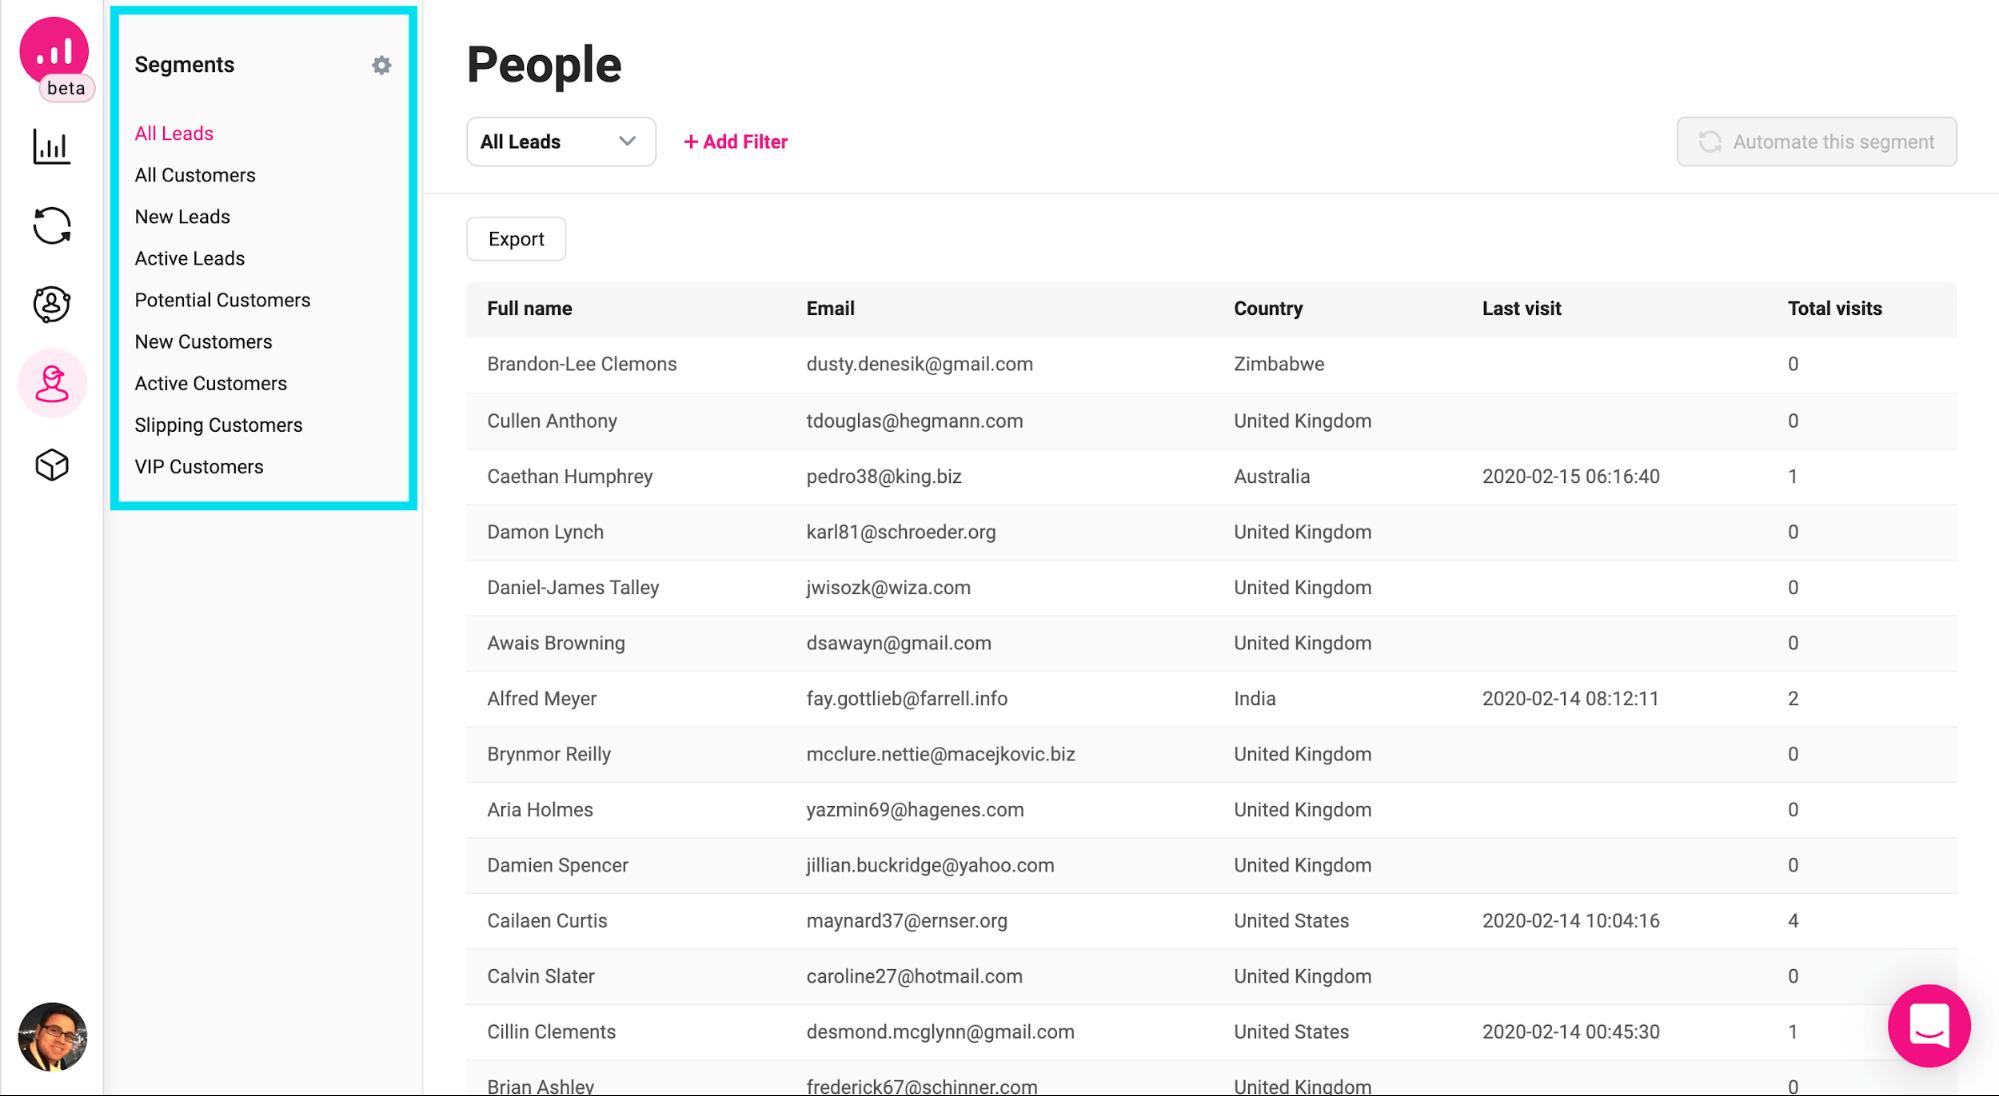 people - segments